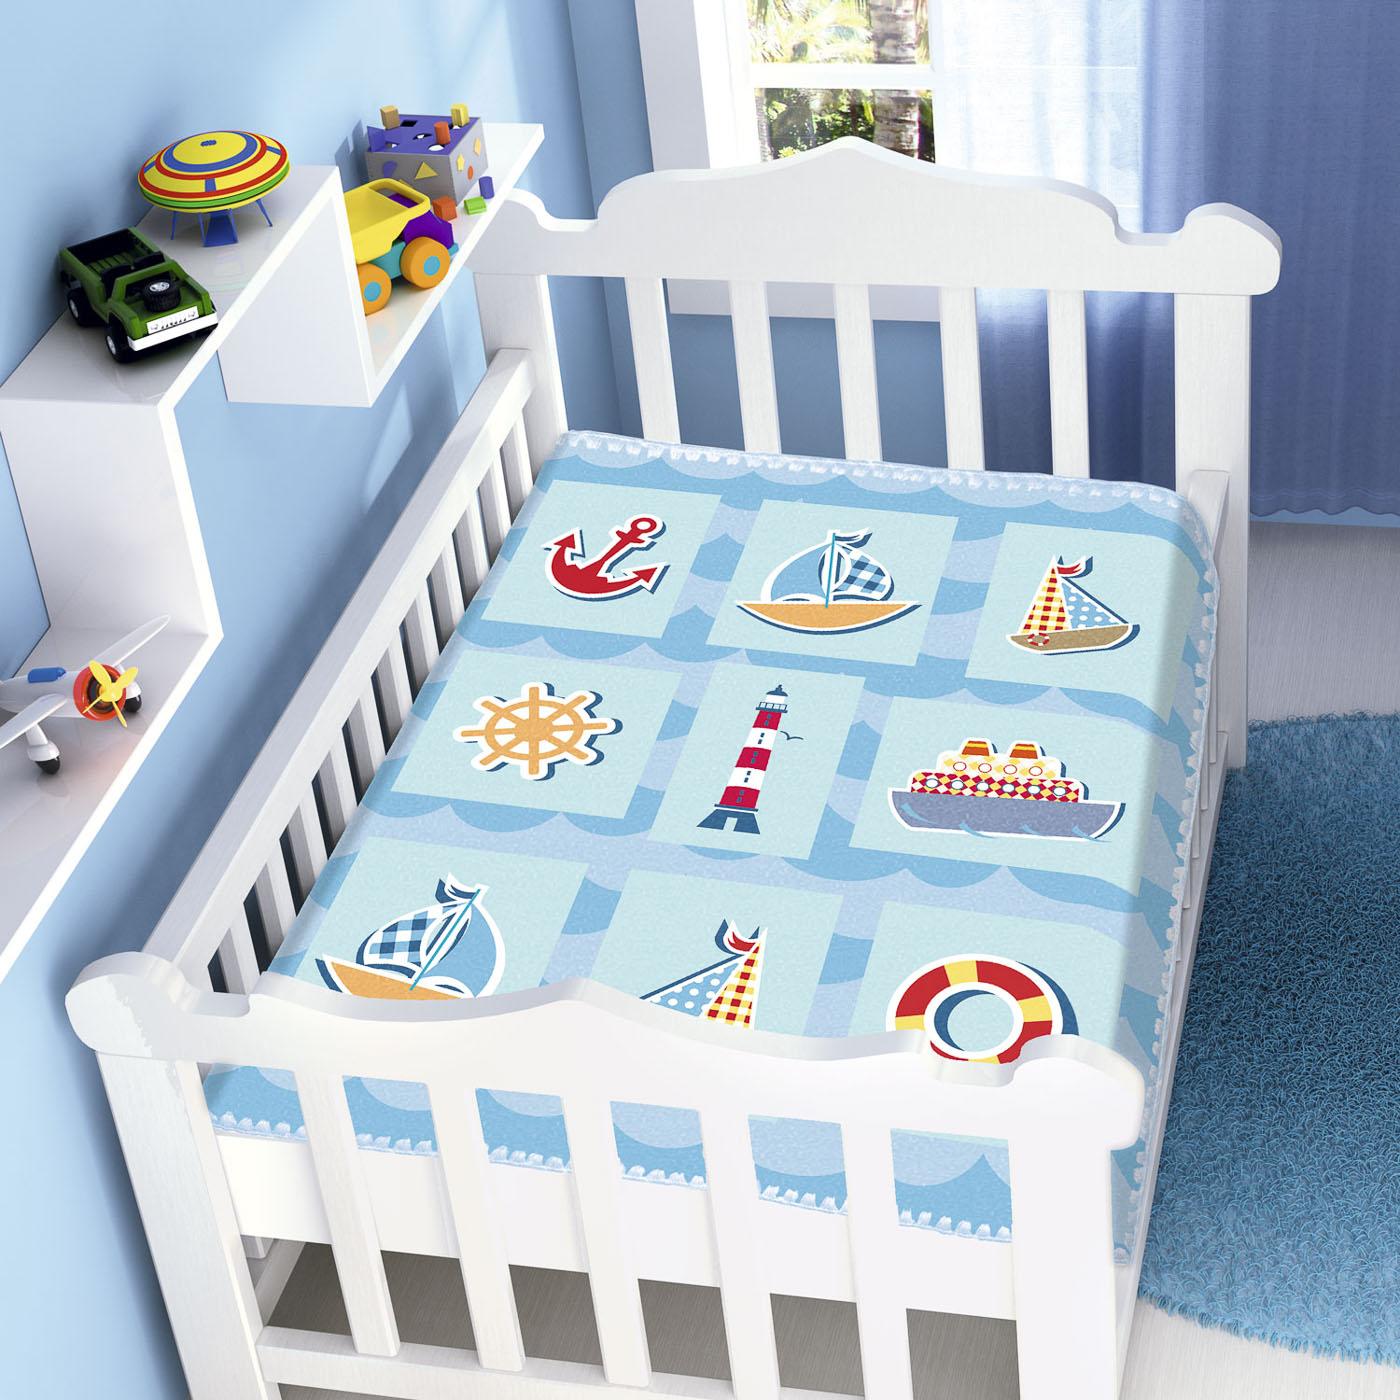 Cobertor Bebê Infantil Jolitex Raschel 0,90x1,10m Barquinhos Azul